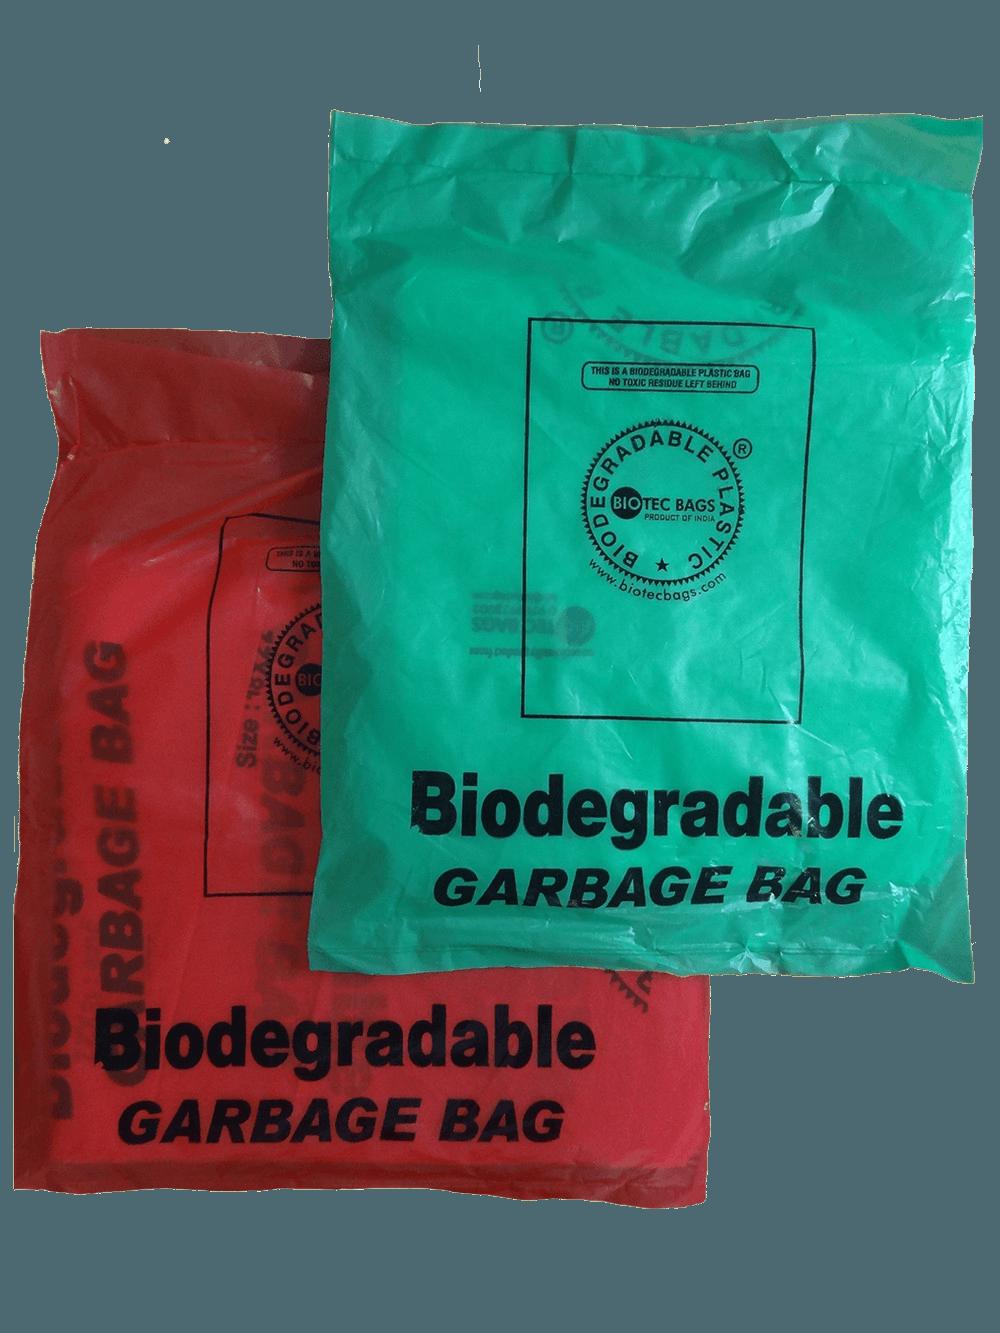 Small Garbage Bags : Biodegradable garbage bags small style guru fashion